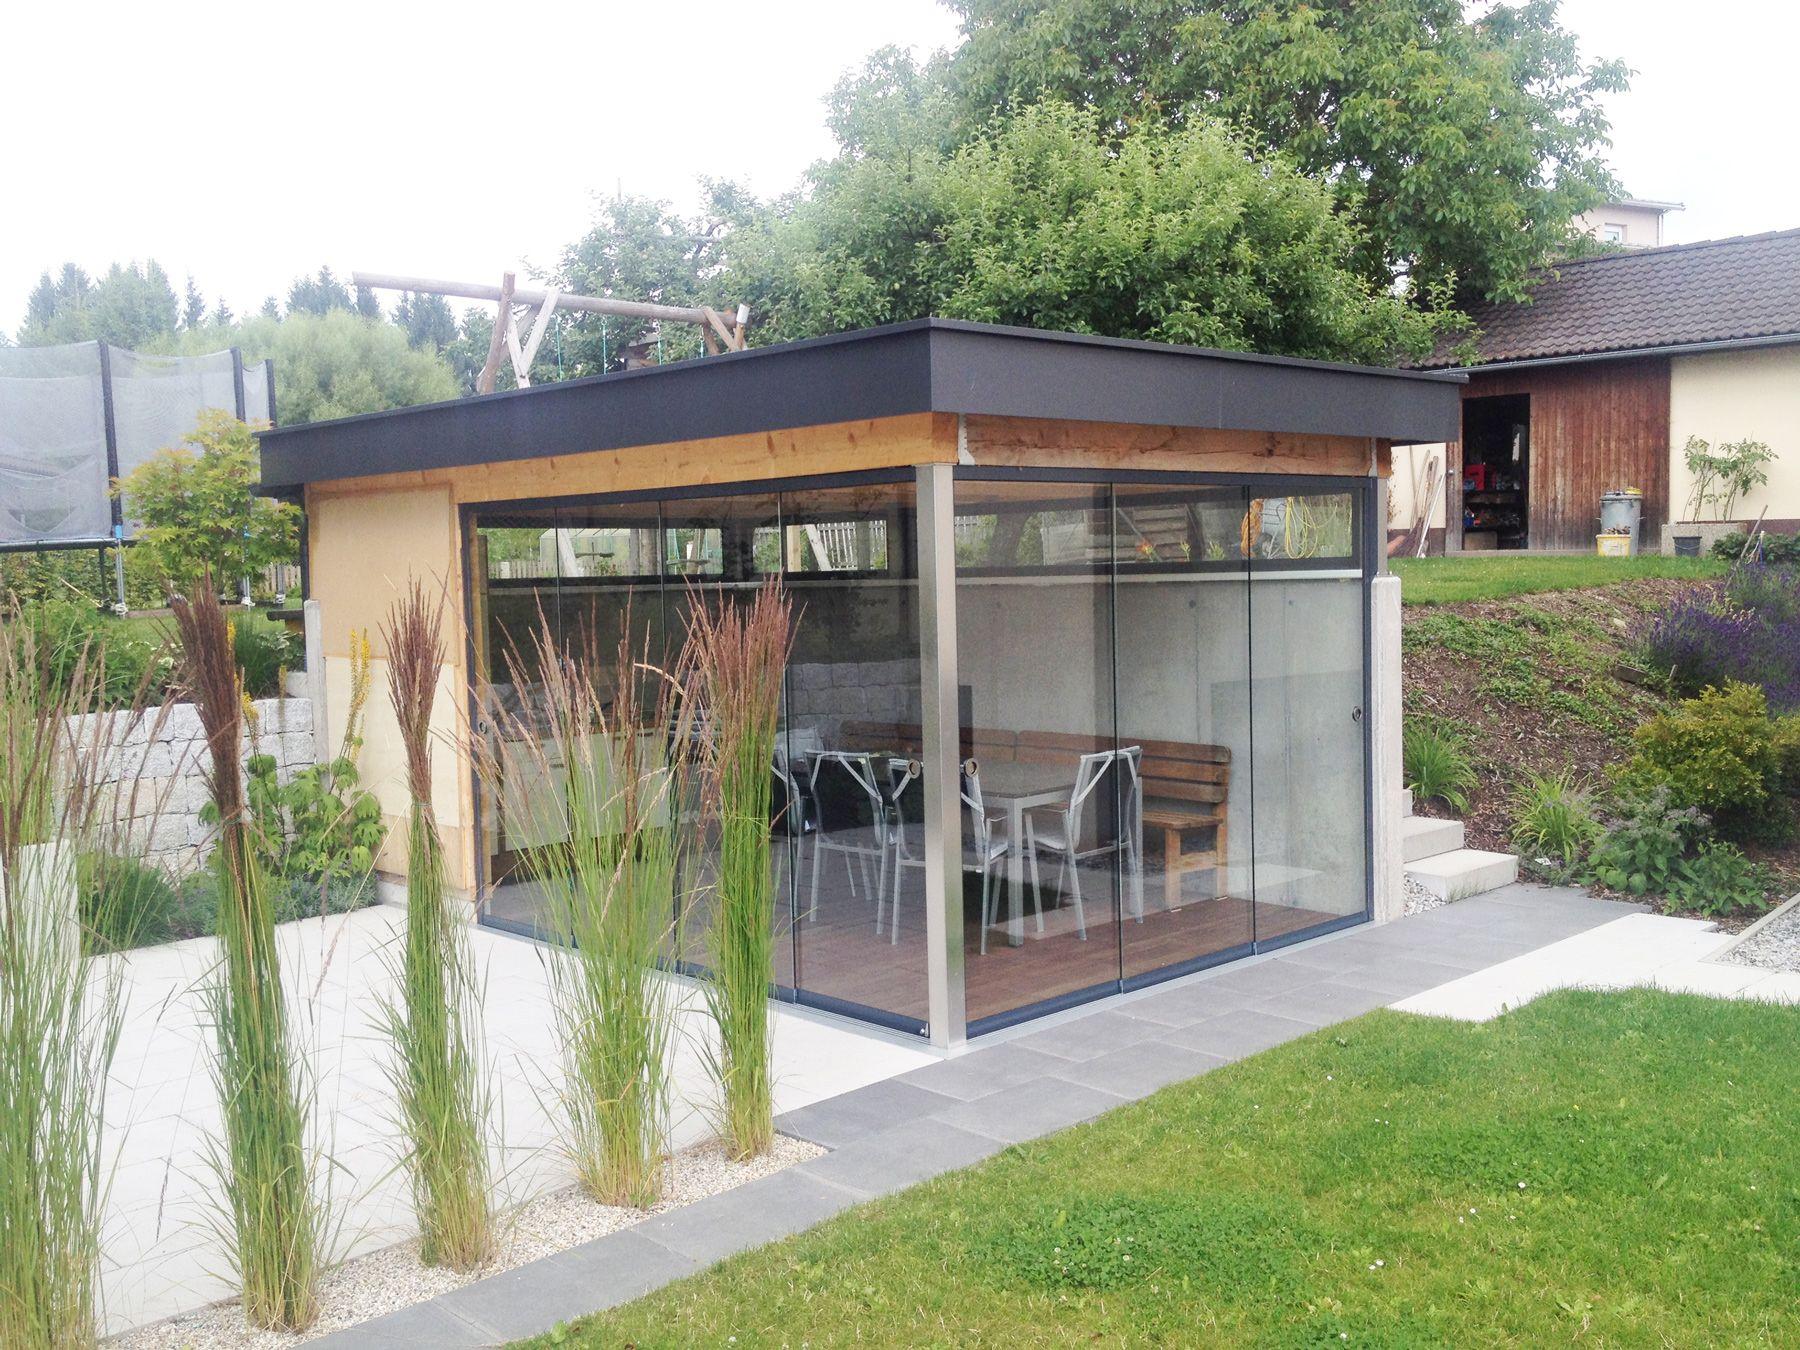 gartenhaus rustikal wohnwand eiche rustikal stock mobel eiche rustikal eiche. Black Bedroom Furniture Sets. Home Design Ideas